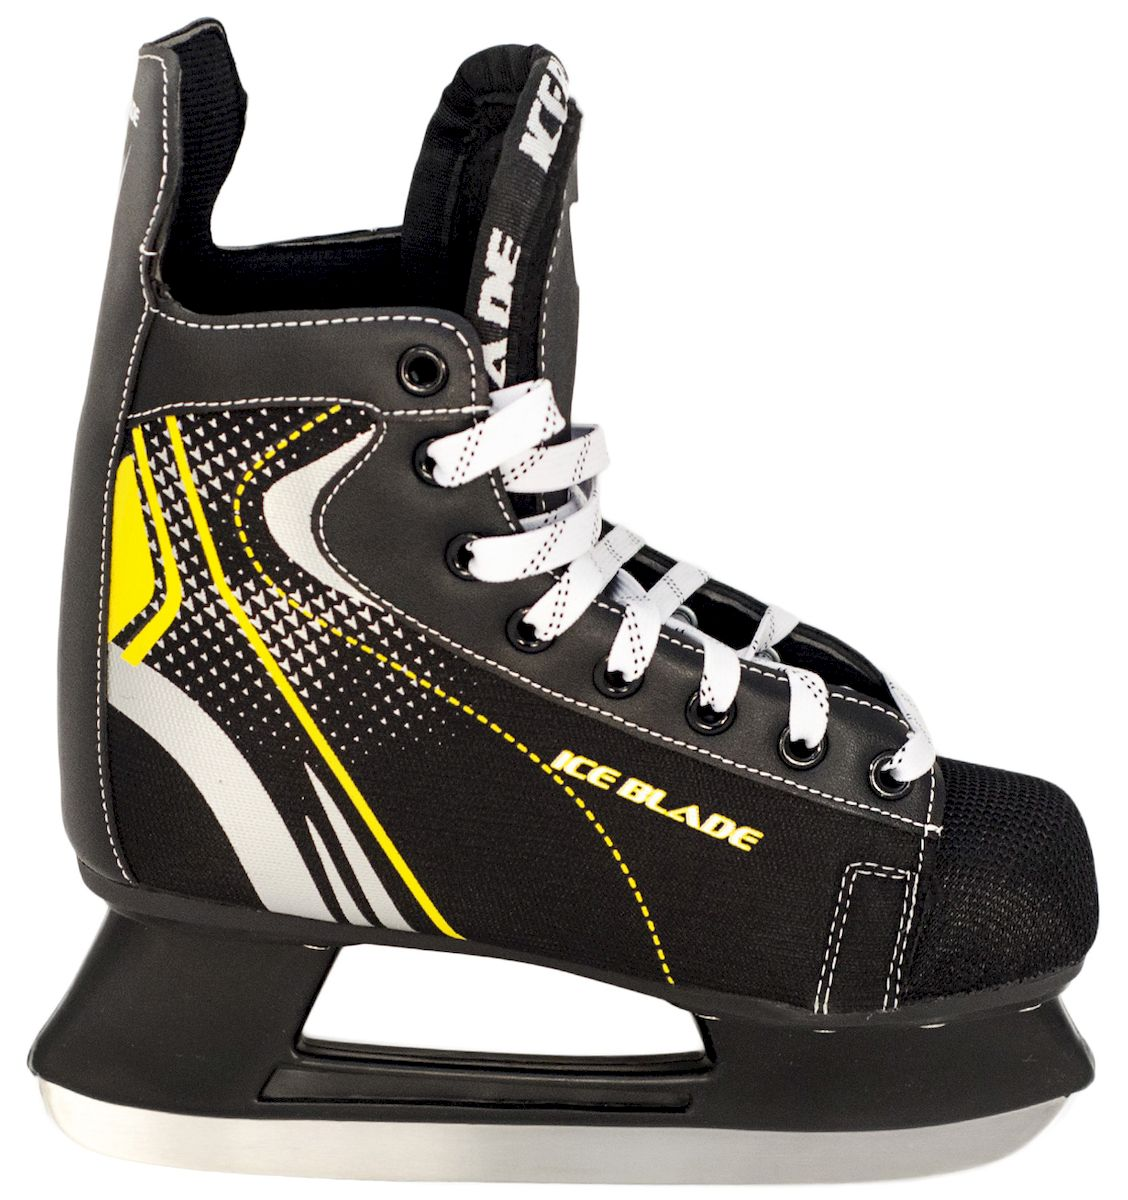 Коньки хоккейные Ice Blade Shark, цвет: черный, желтый. УТ-00006841. Размер 45 коньки хоккейные для мальчика ice blade wicked цвет серый черный размер 34